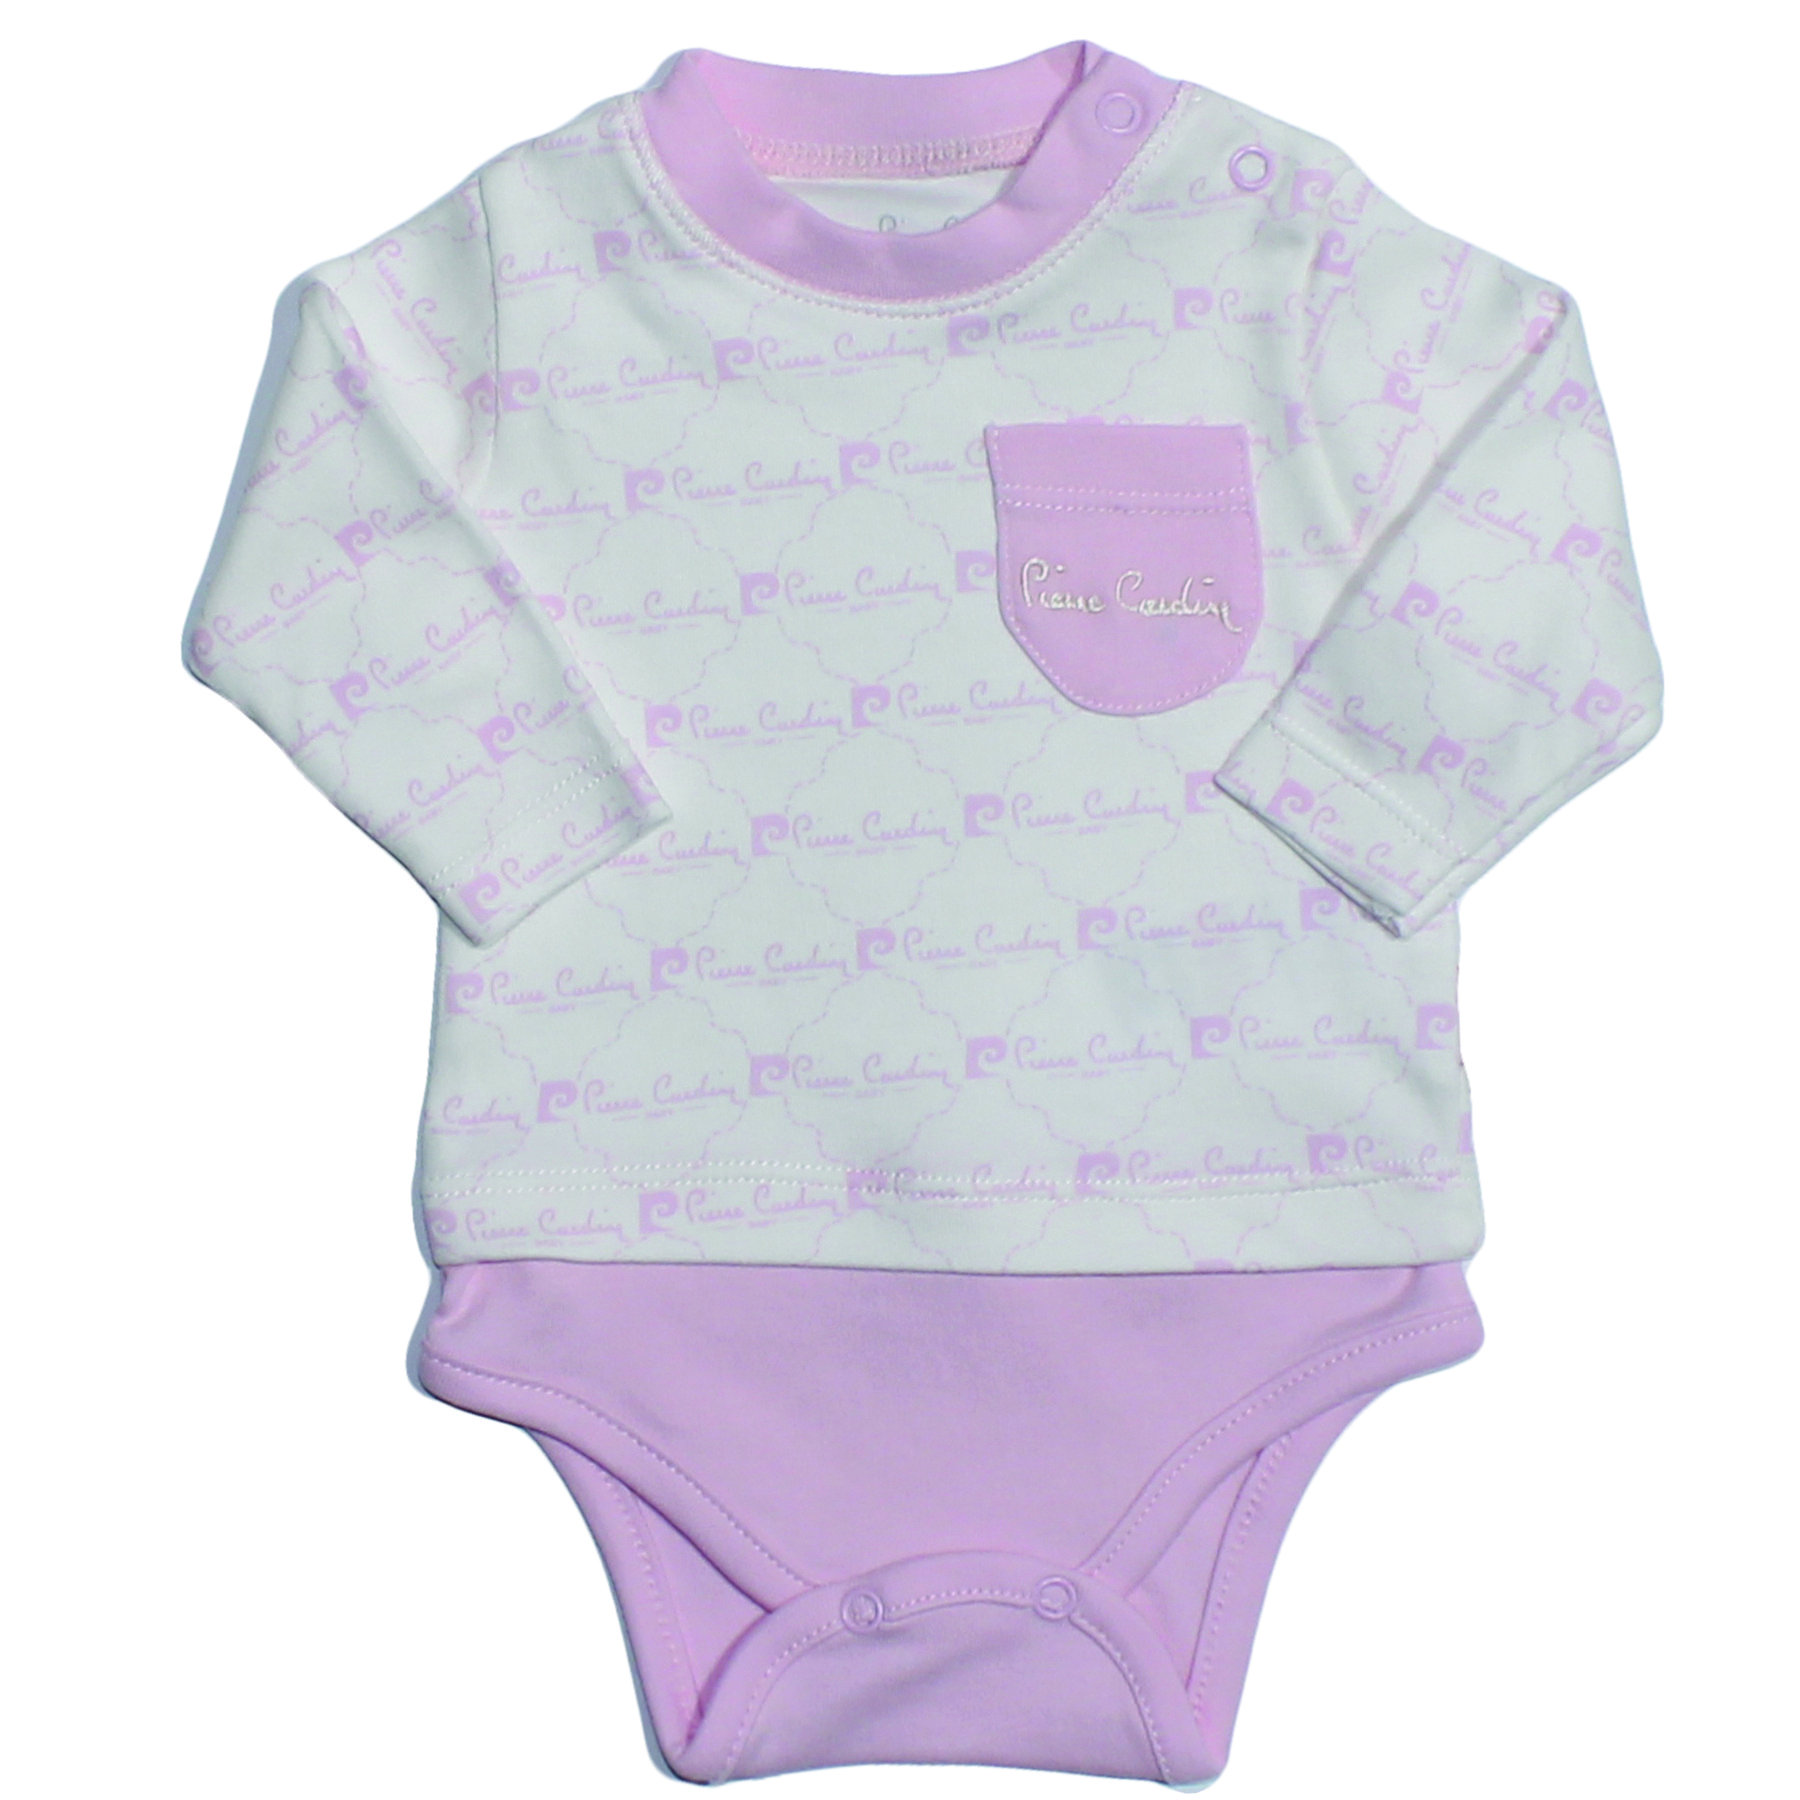 Pierre Cardin Cream Pink Printed Long Sleeve The Zibin